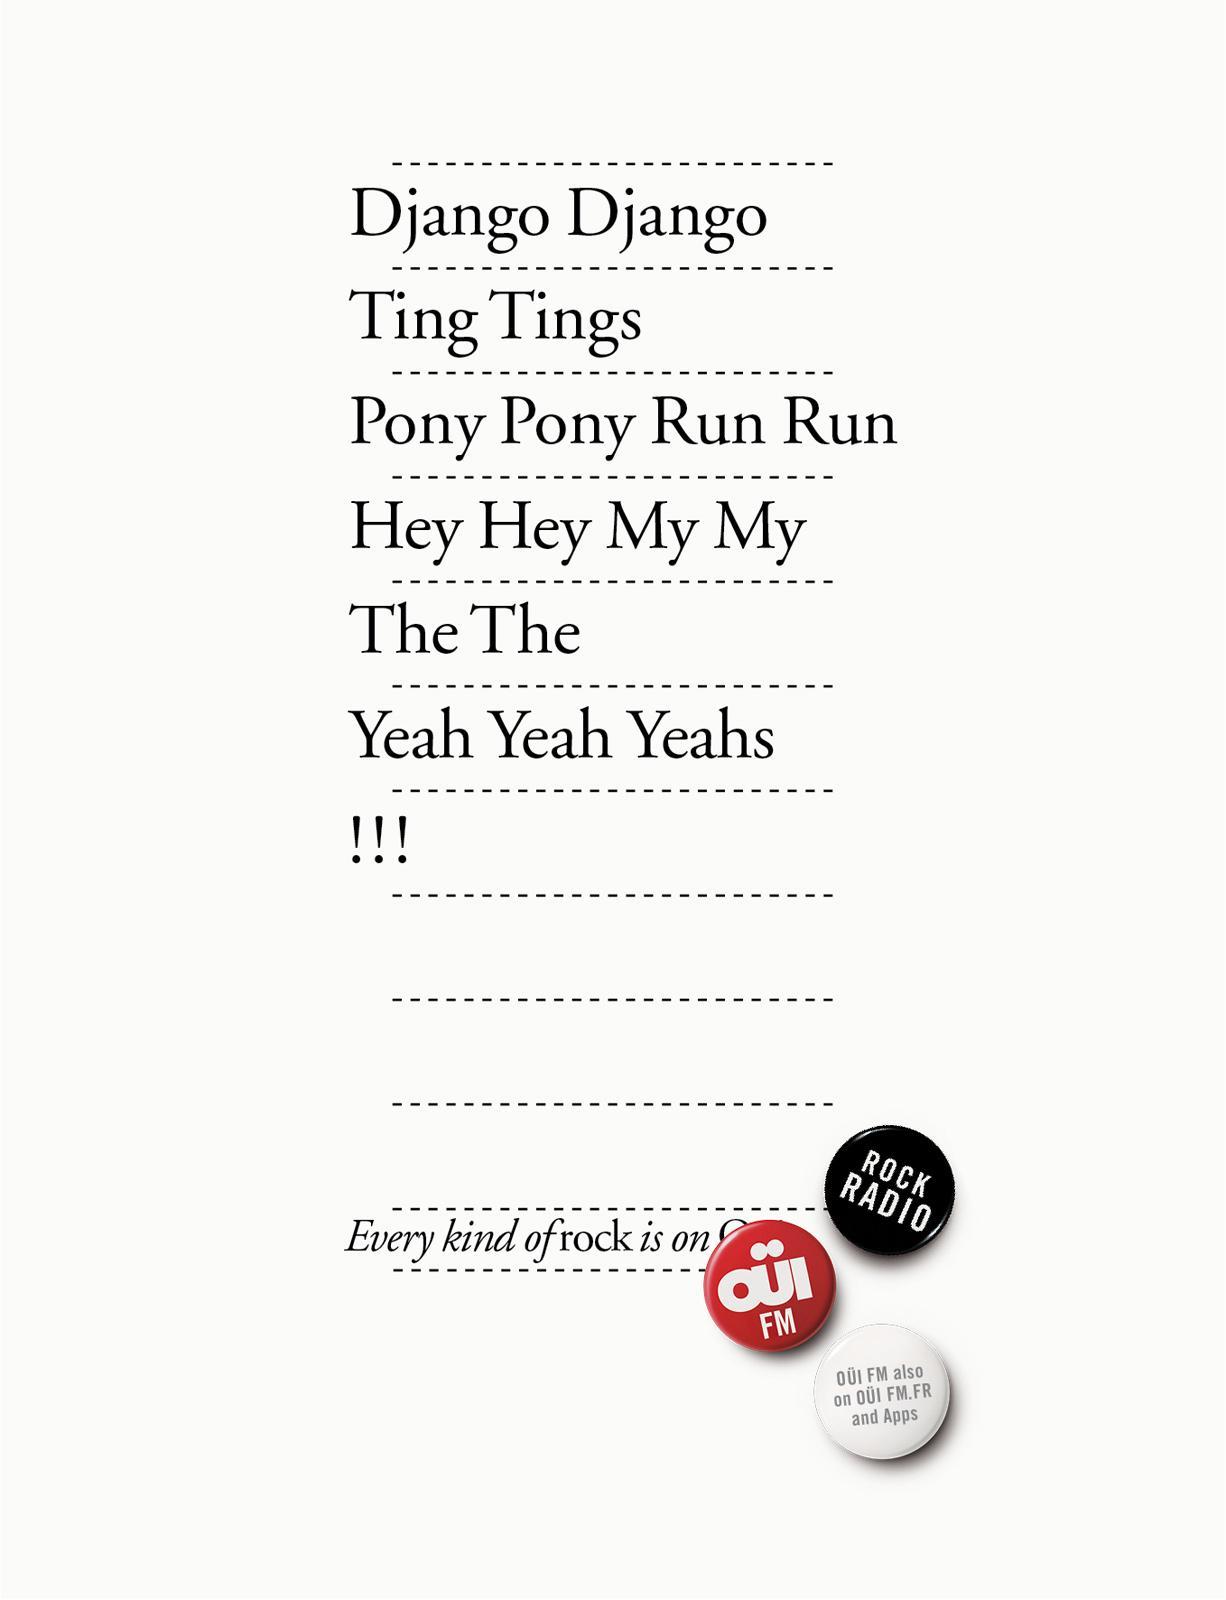 Oui FM Print Ad -  Every kind of rock, 8